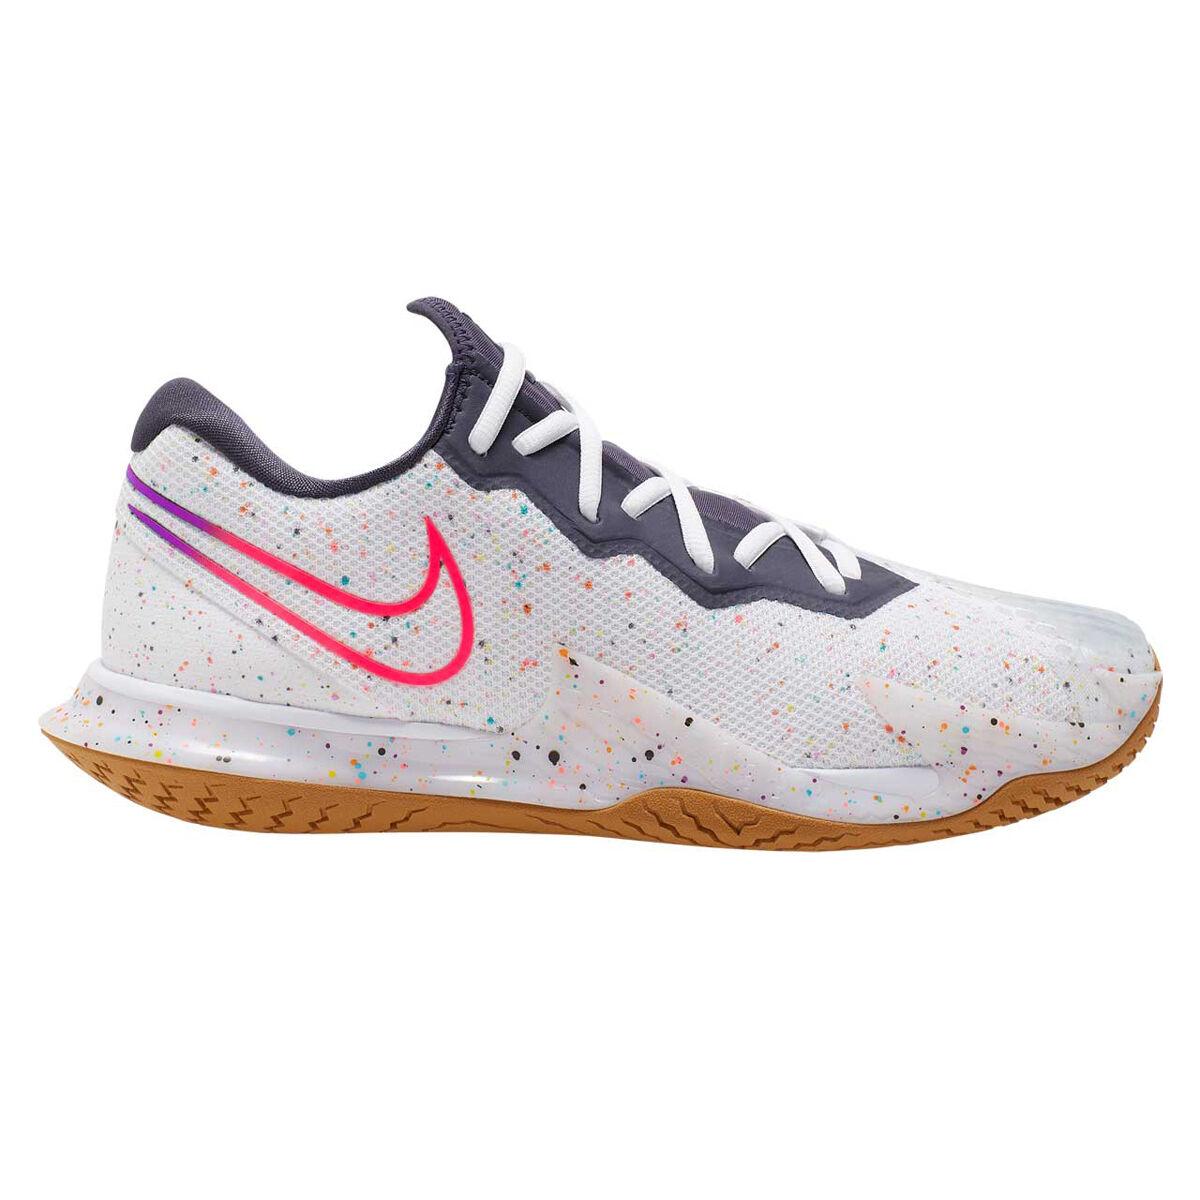 Nike Air Zoom Vapor Cage 4 Hardcourt